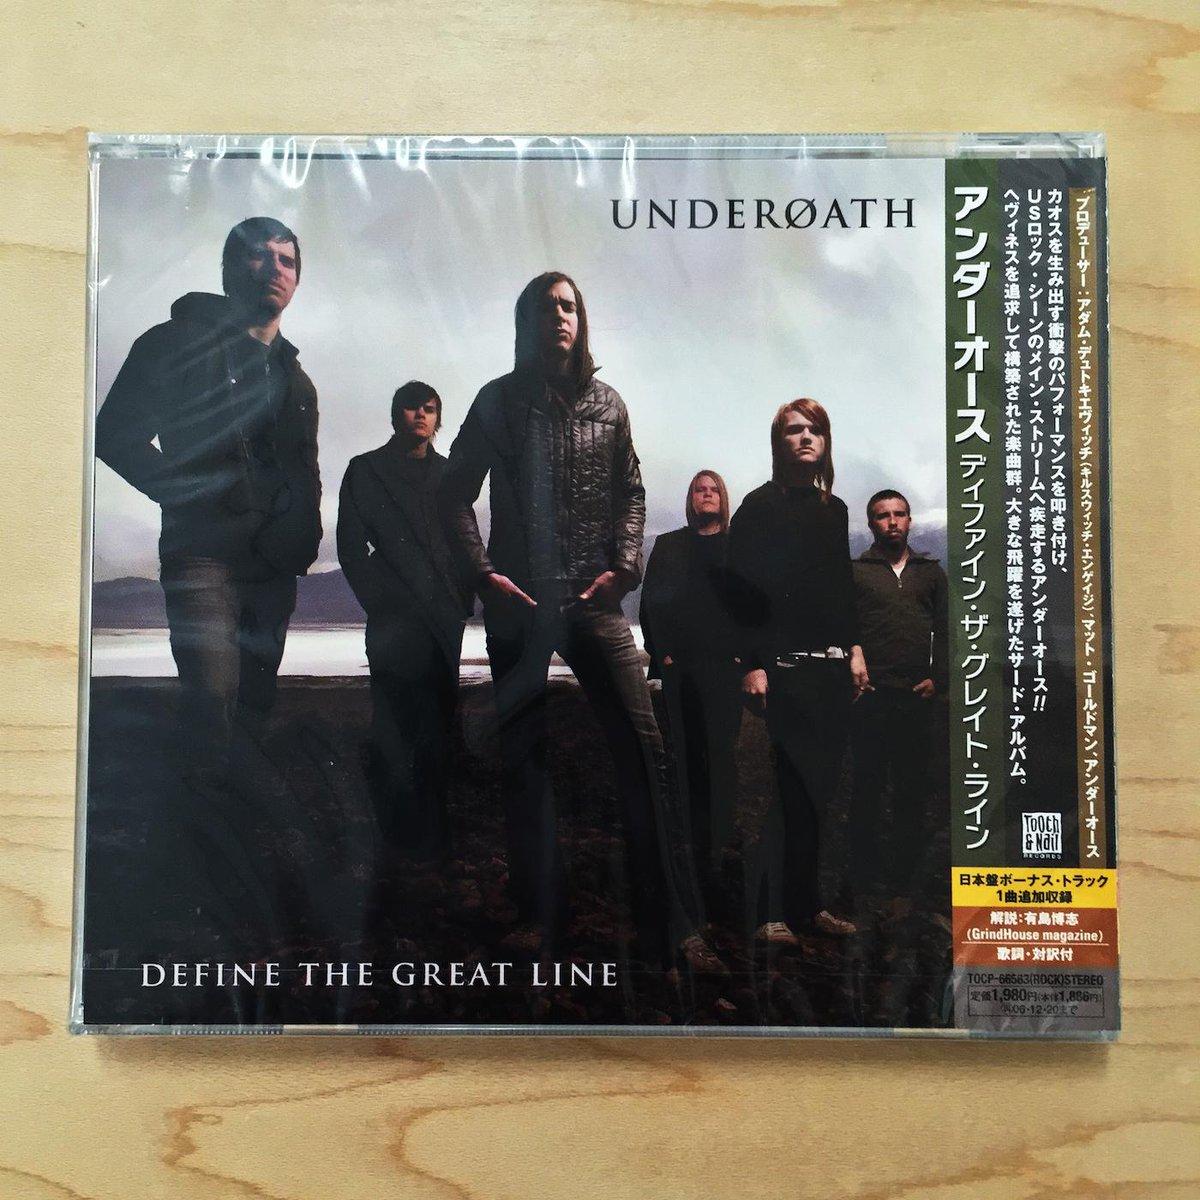 OK, here's a good one. Retweet (& Follow) for a shot to win this @UnderoathBand #DefineTheGreatLine JP import CD! http://t.co/3qFwuPbNoK